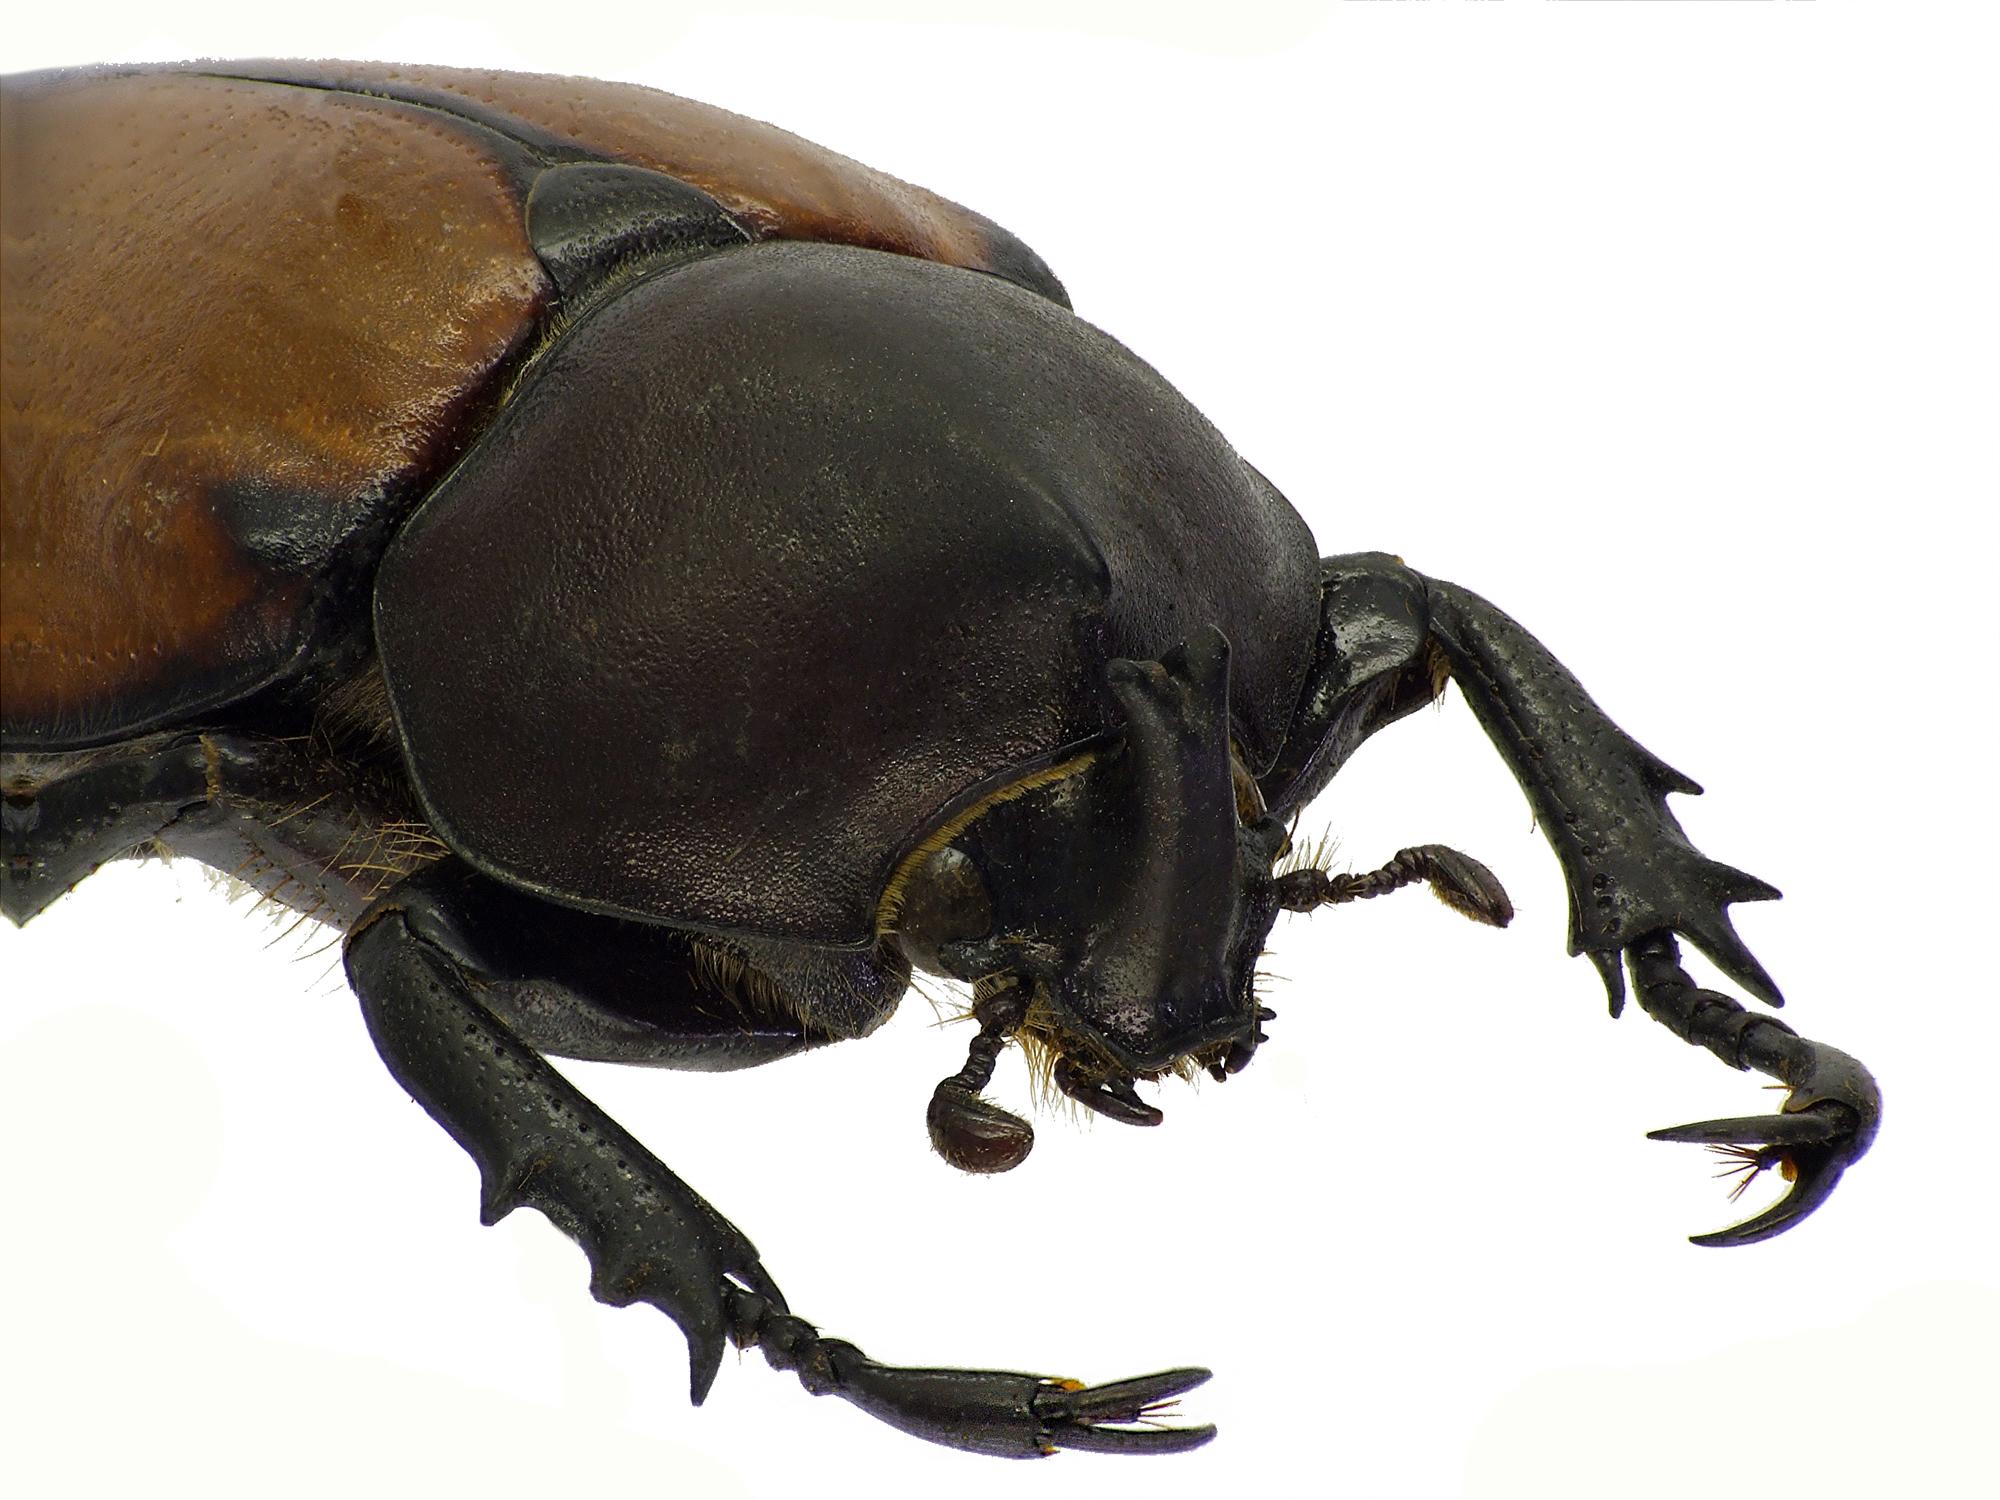 Mitracephala humboldti 81364cz82 .jpg